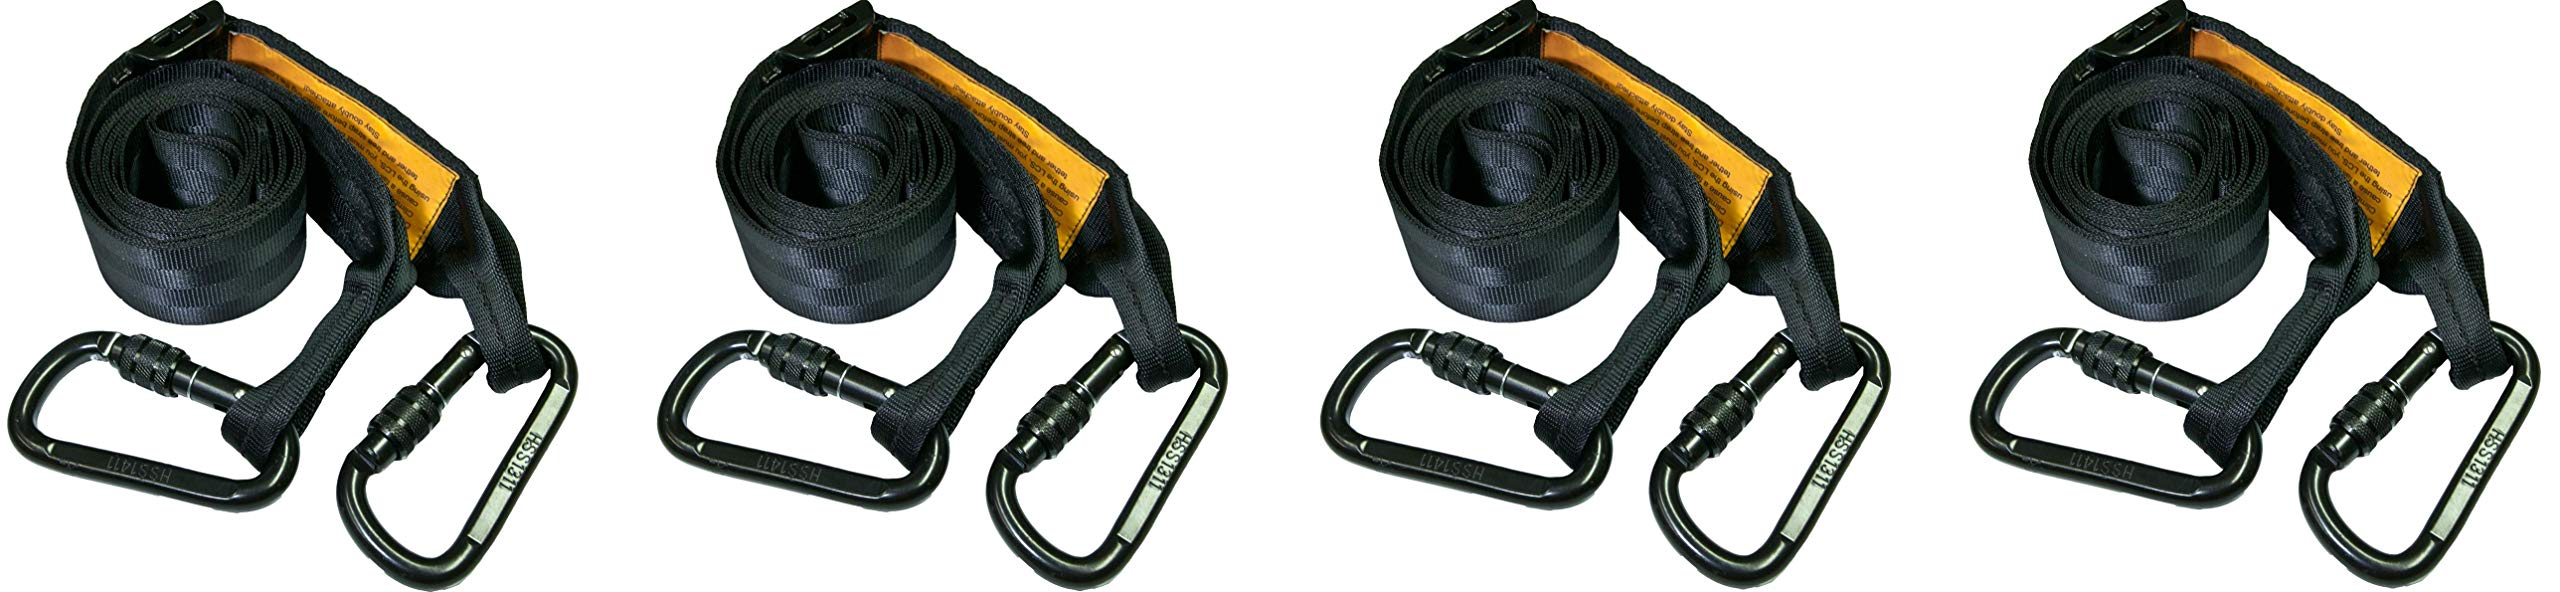 Hunter Safety System LCS Lineman's Climbing Strap (Fоur Расk)